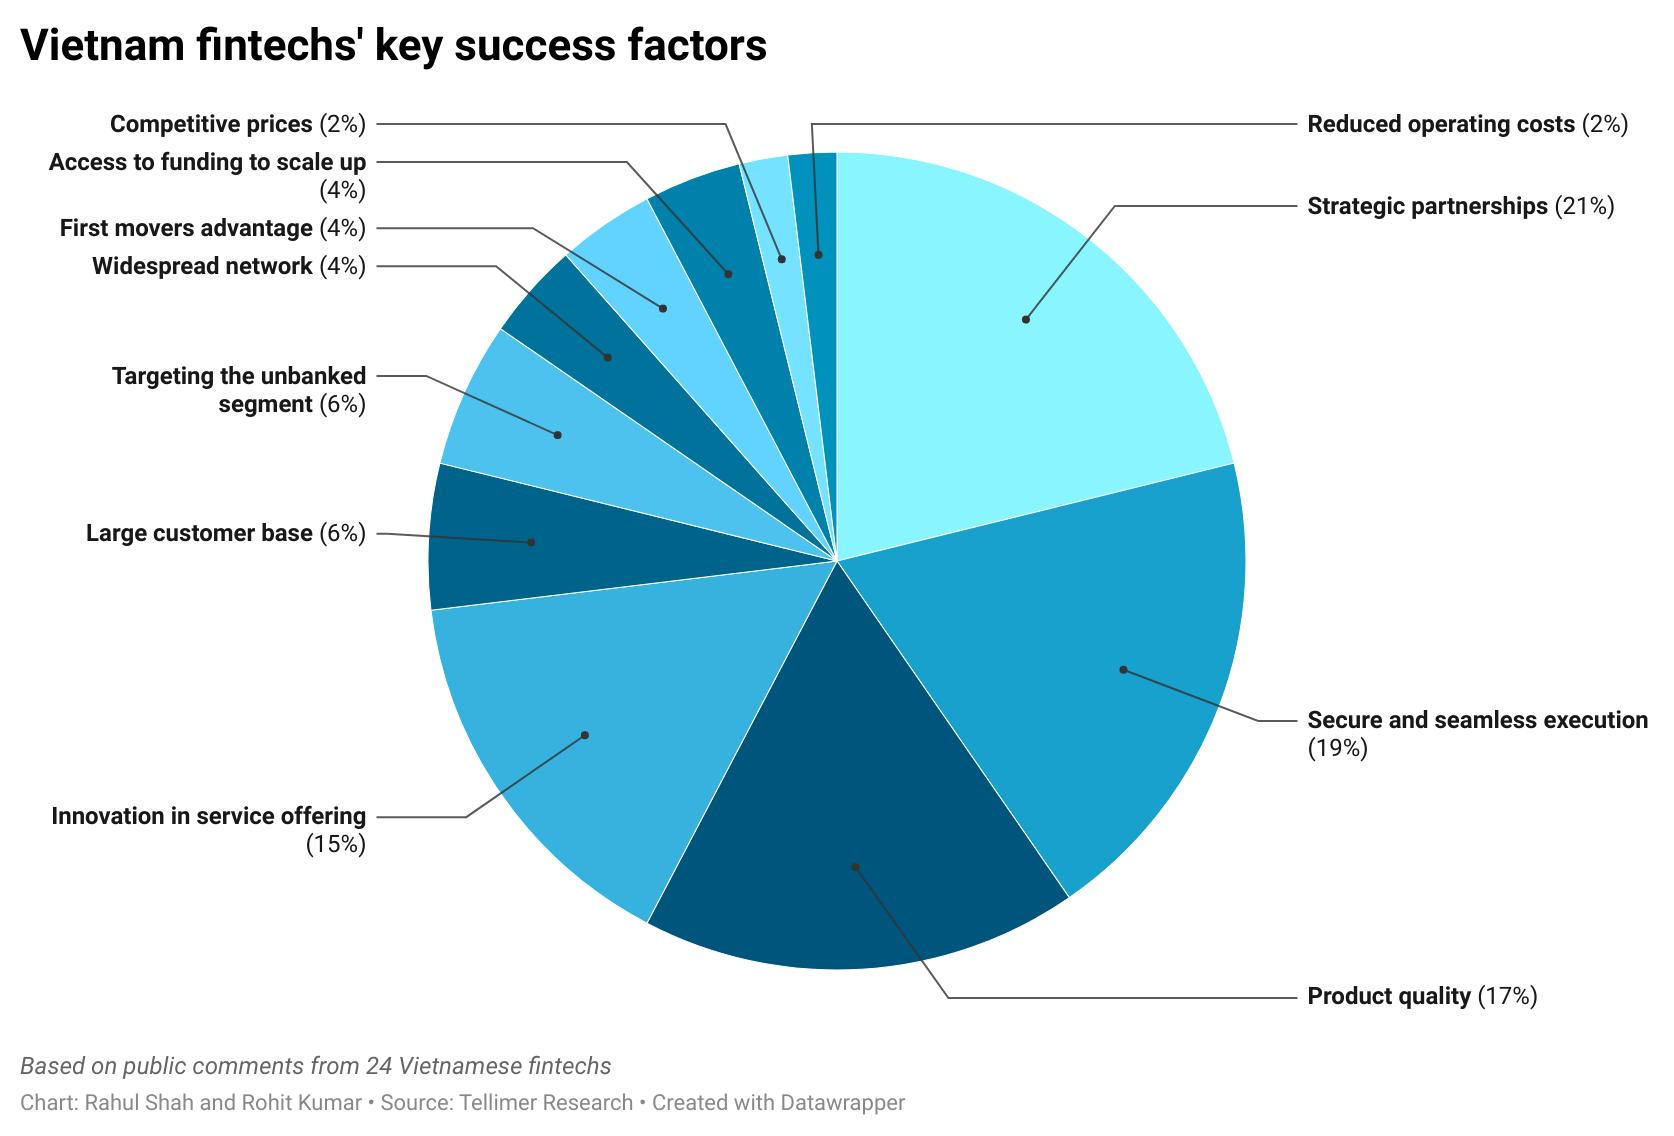 Vietnam fintechs' key success factors